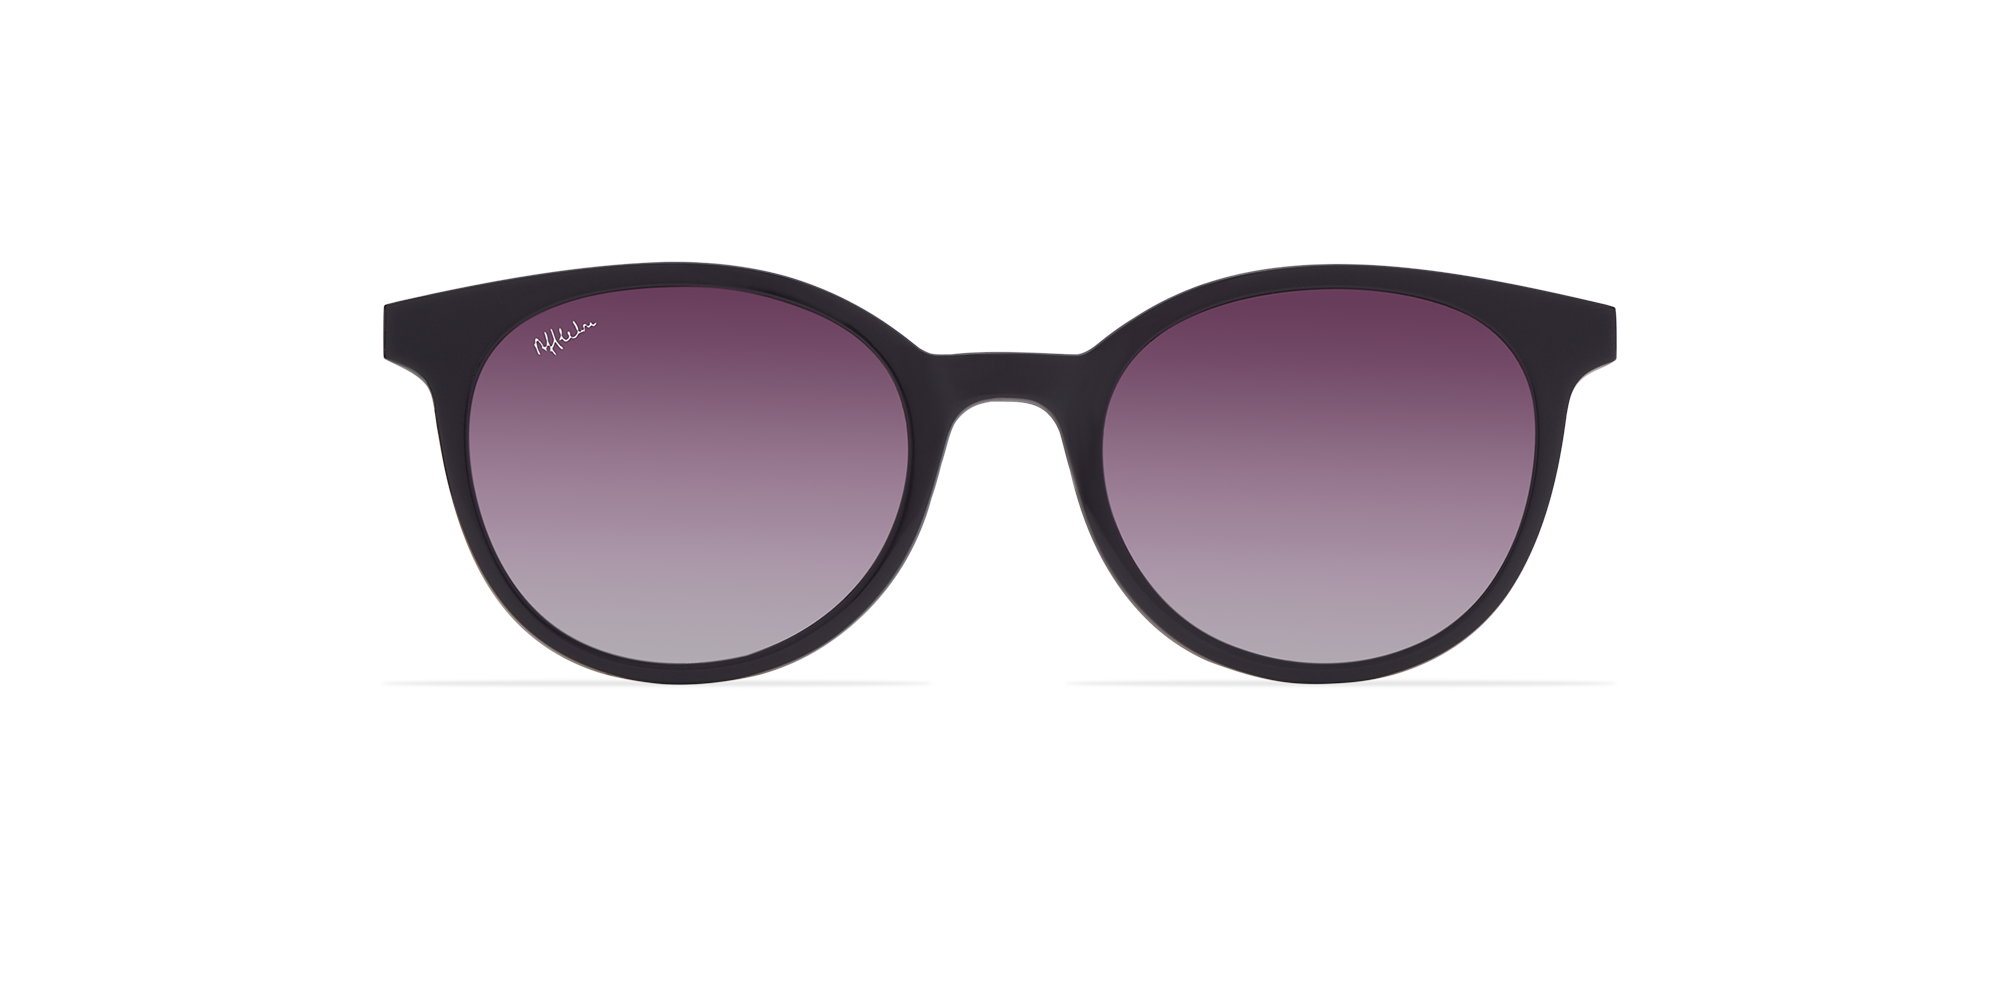 afflelou/france/products/smart_clip/clips_glasses/TMK36POPU014819.png